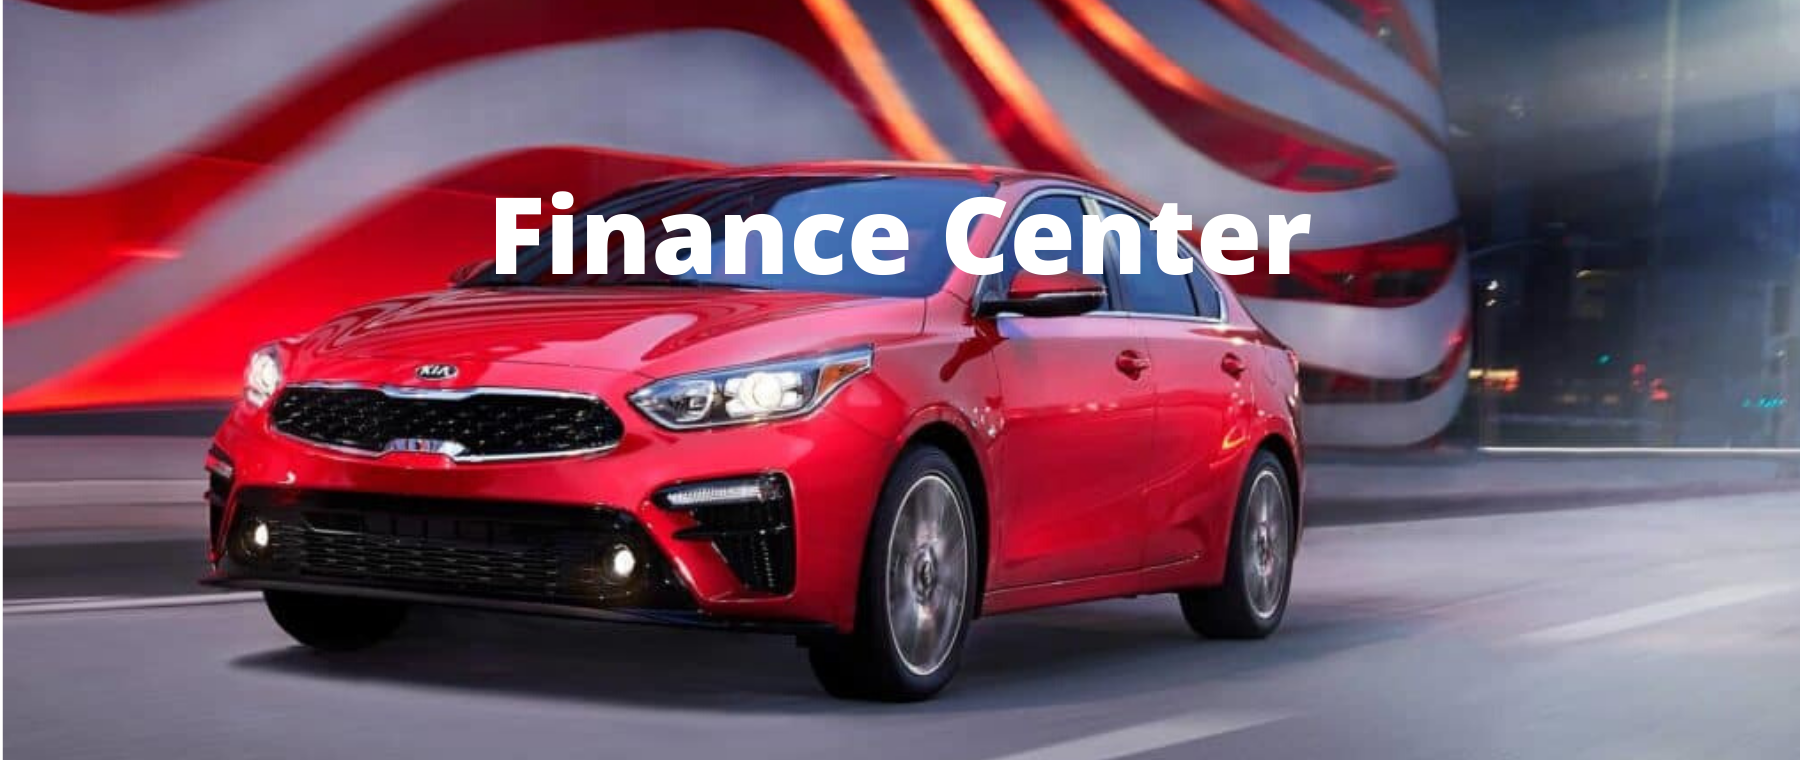 Red Kia Forte Finance